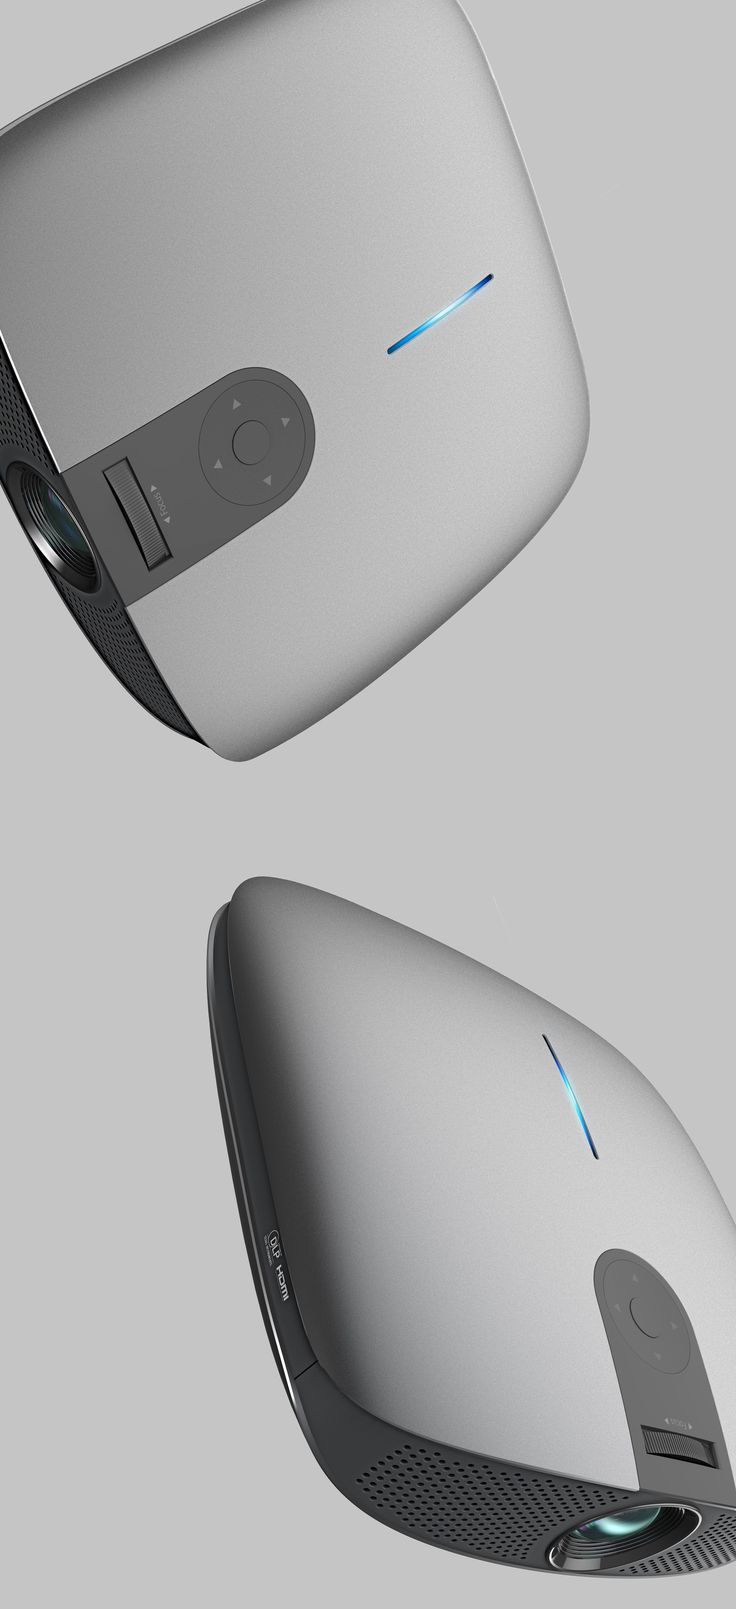 Product design / Industrial design / 제품디자인 / 산업디자인 / beam / projector /design